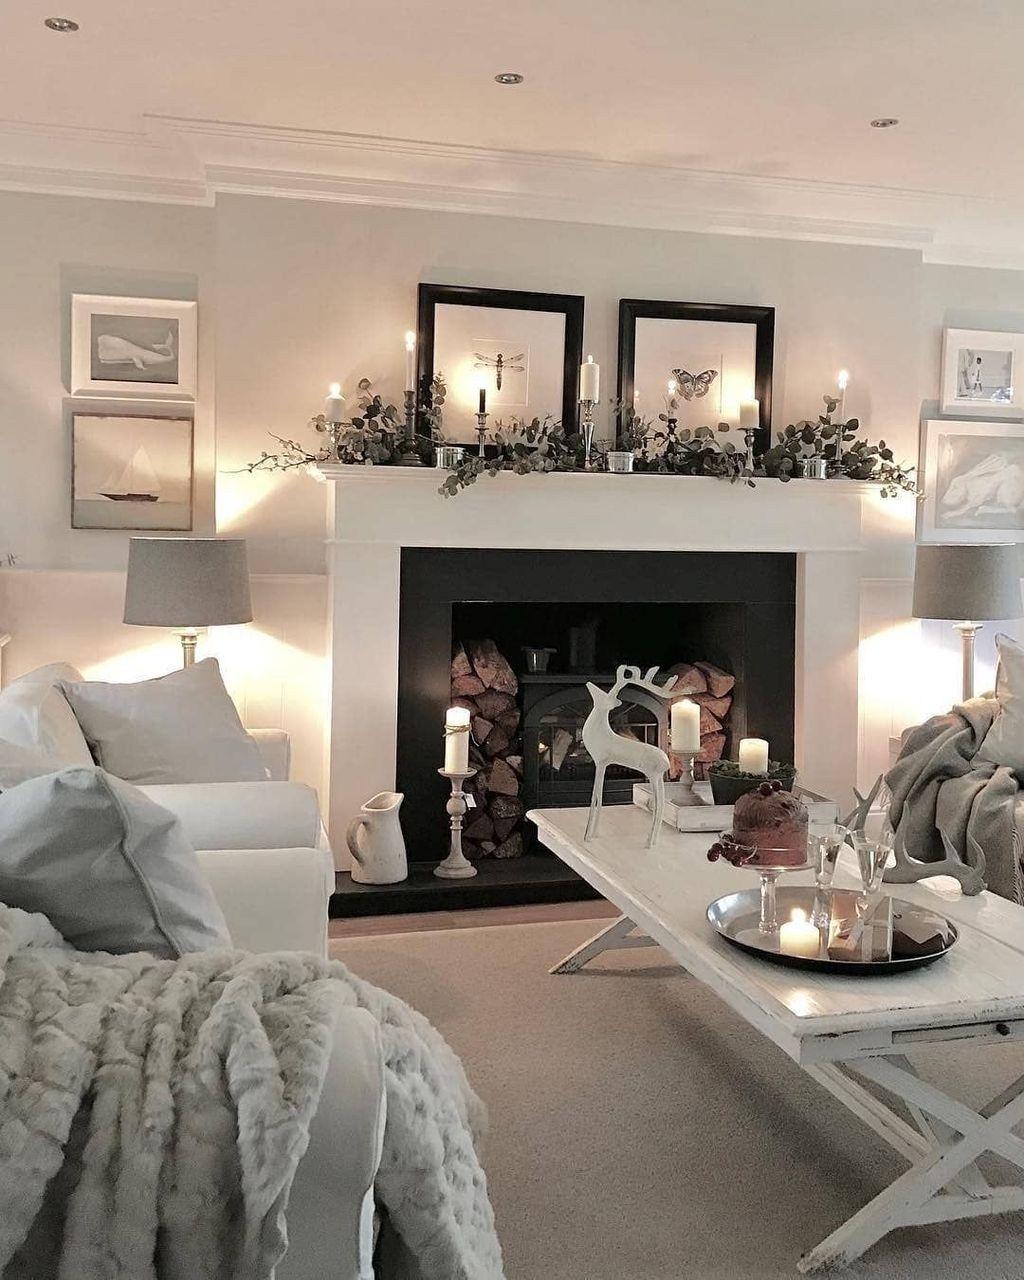 Affordable Apartment Living Room Design Ideas With Black And White Style 42 Apartment Living Room Design Living Room Decor Apartment Apartment Living Room